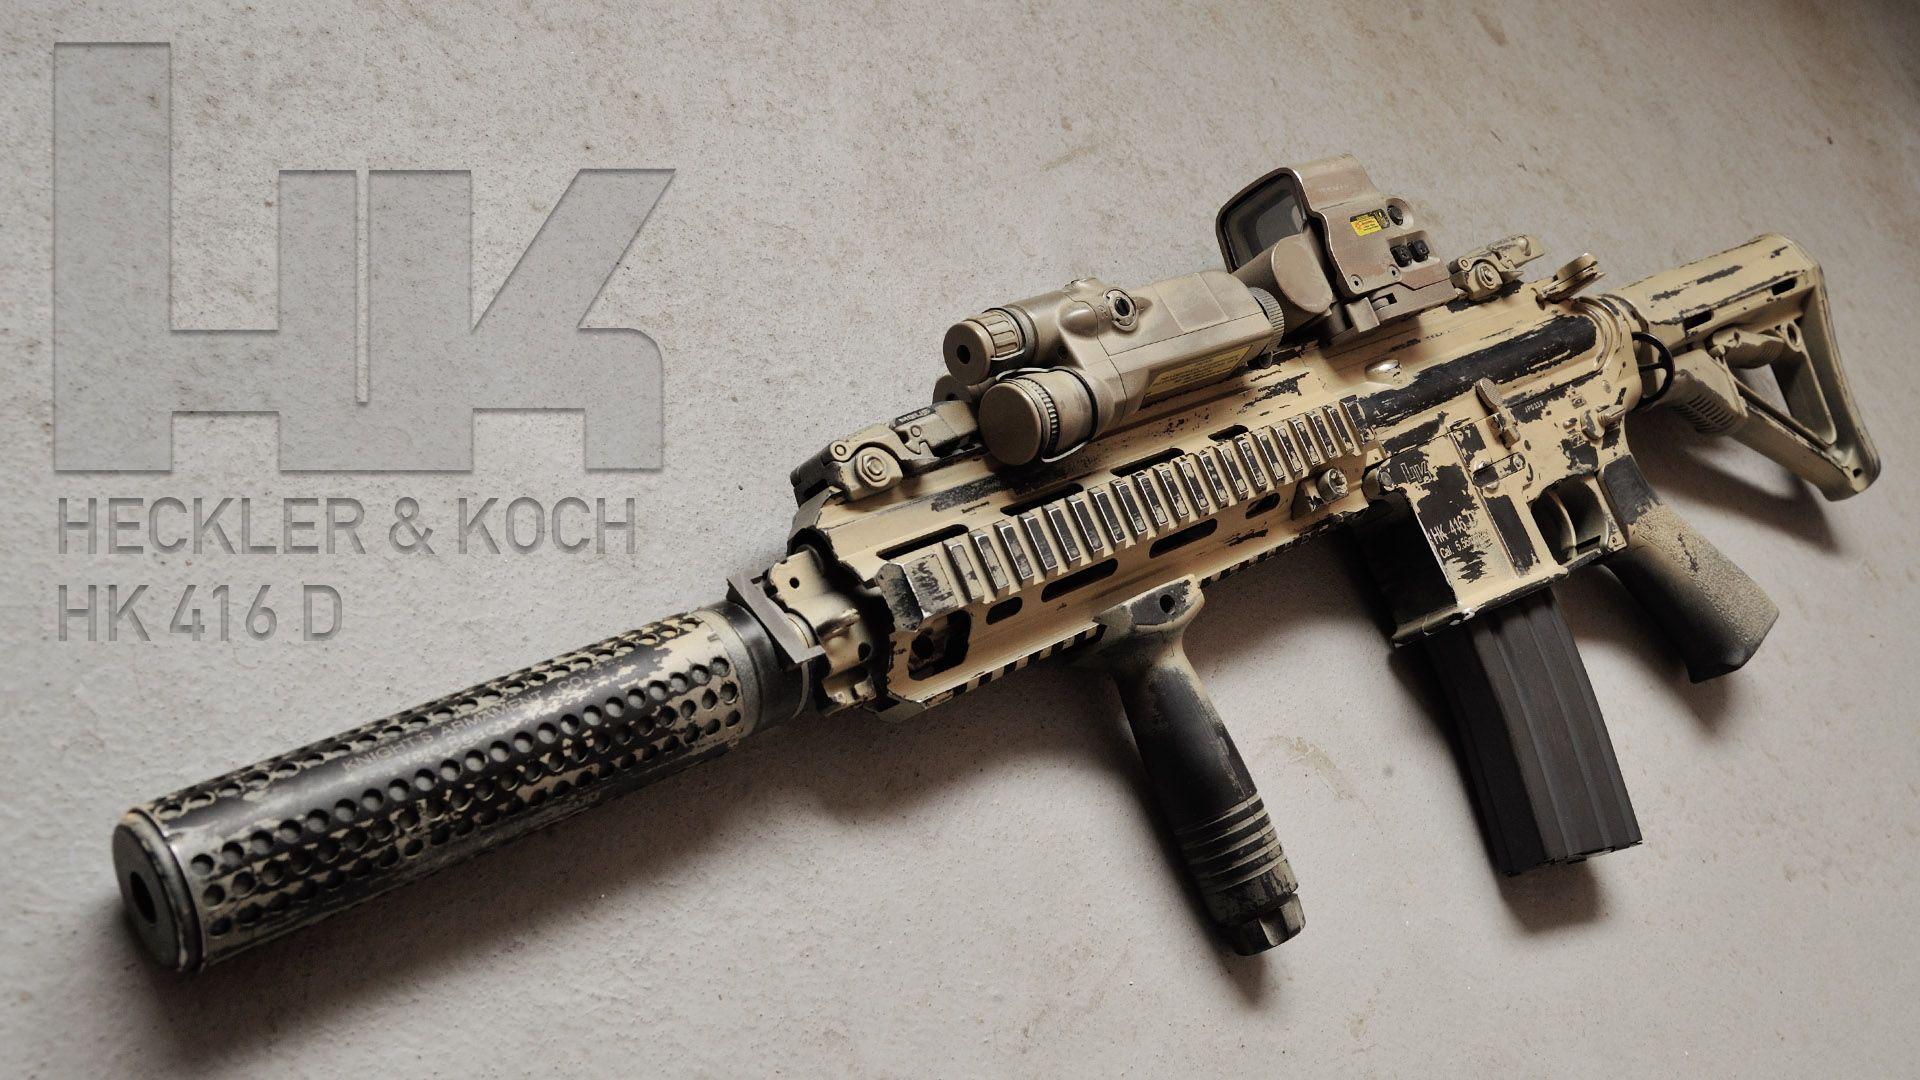 Hk416 Hk416d | guns | Pinterest | Guns, Weapons and Firearms